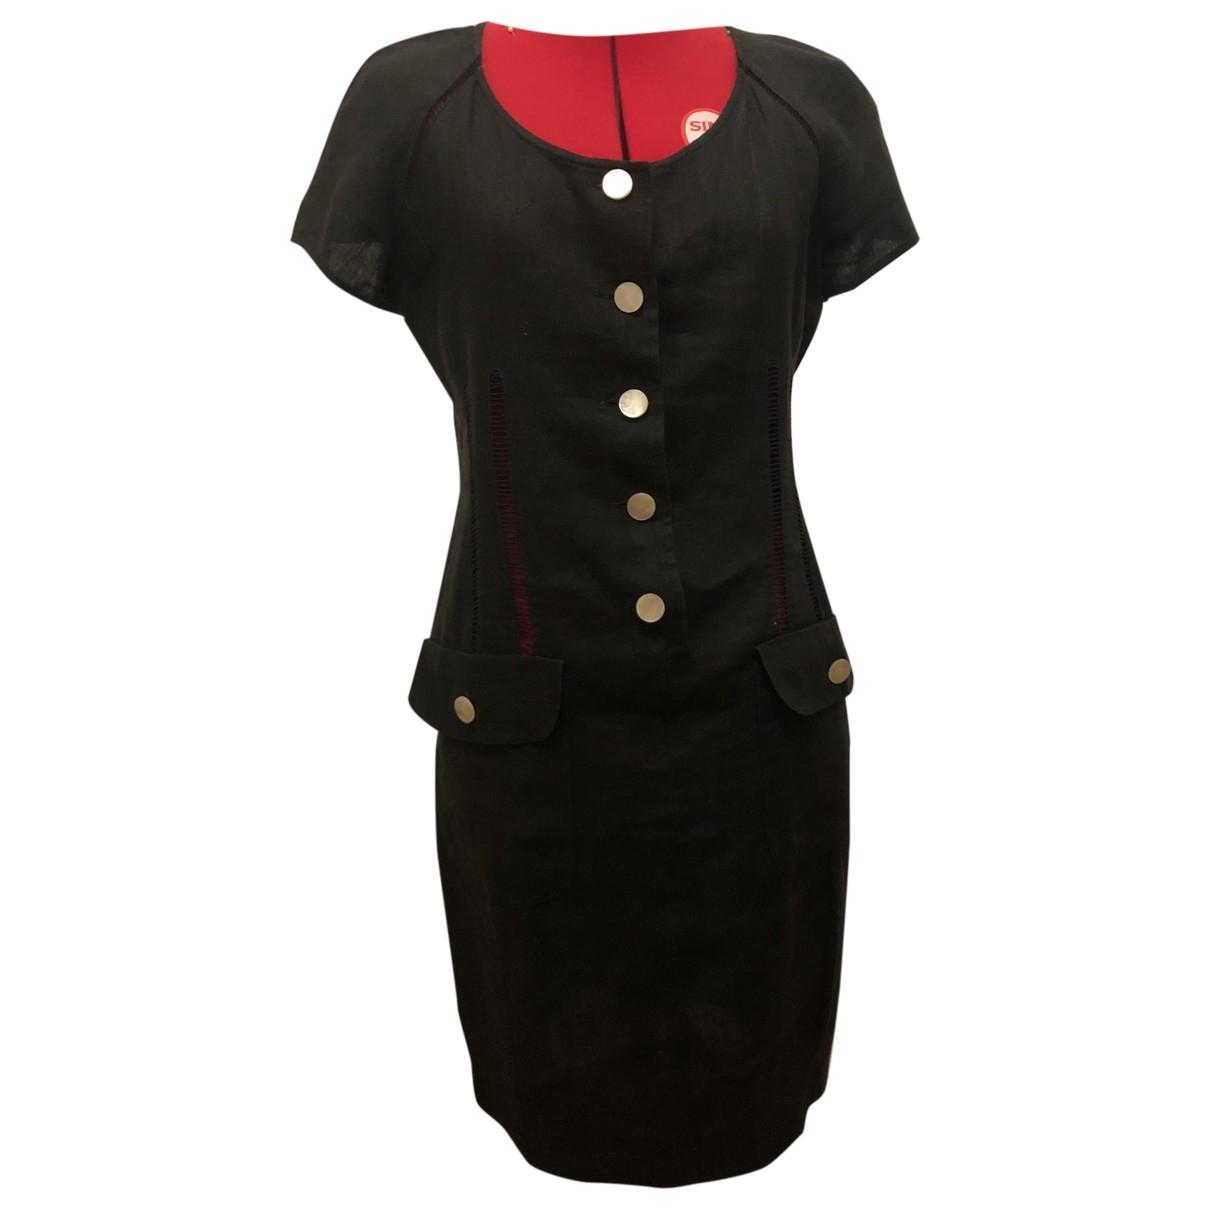 Valentino Garavani \N Black Linen dress for Women 42 IT